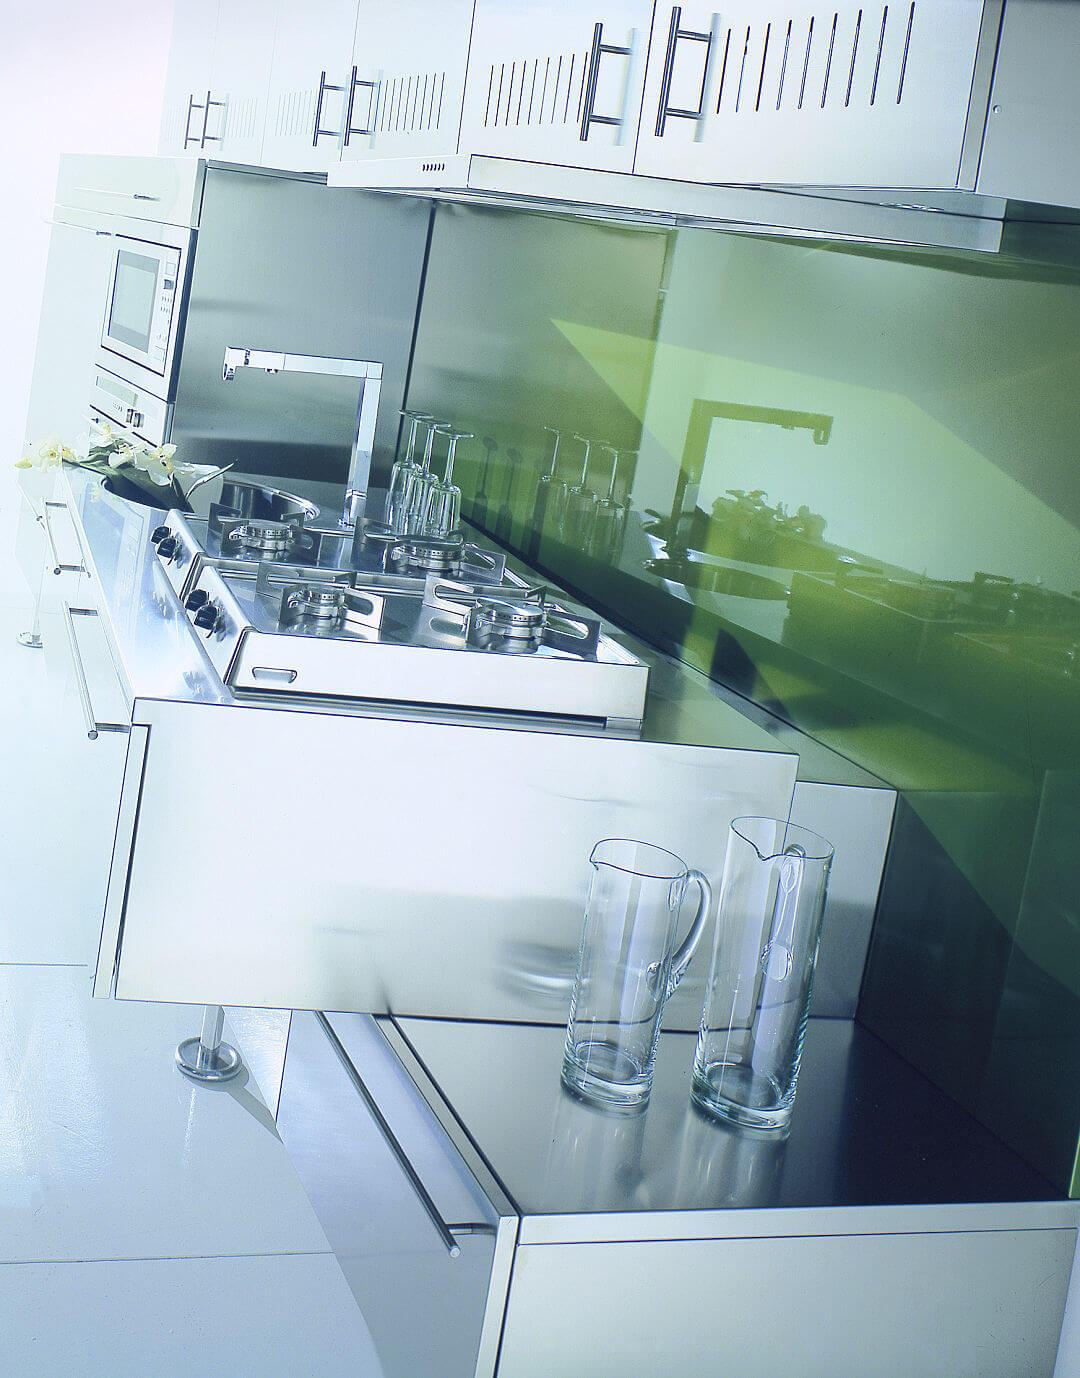 Arca Cucine Italia - Cucina in Acciaio Inox su misura - Piano Cottura